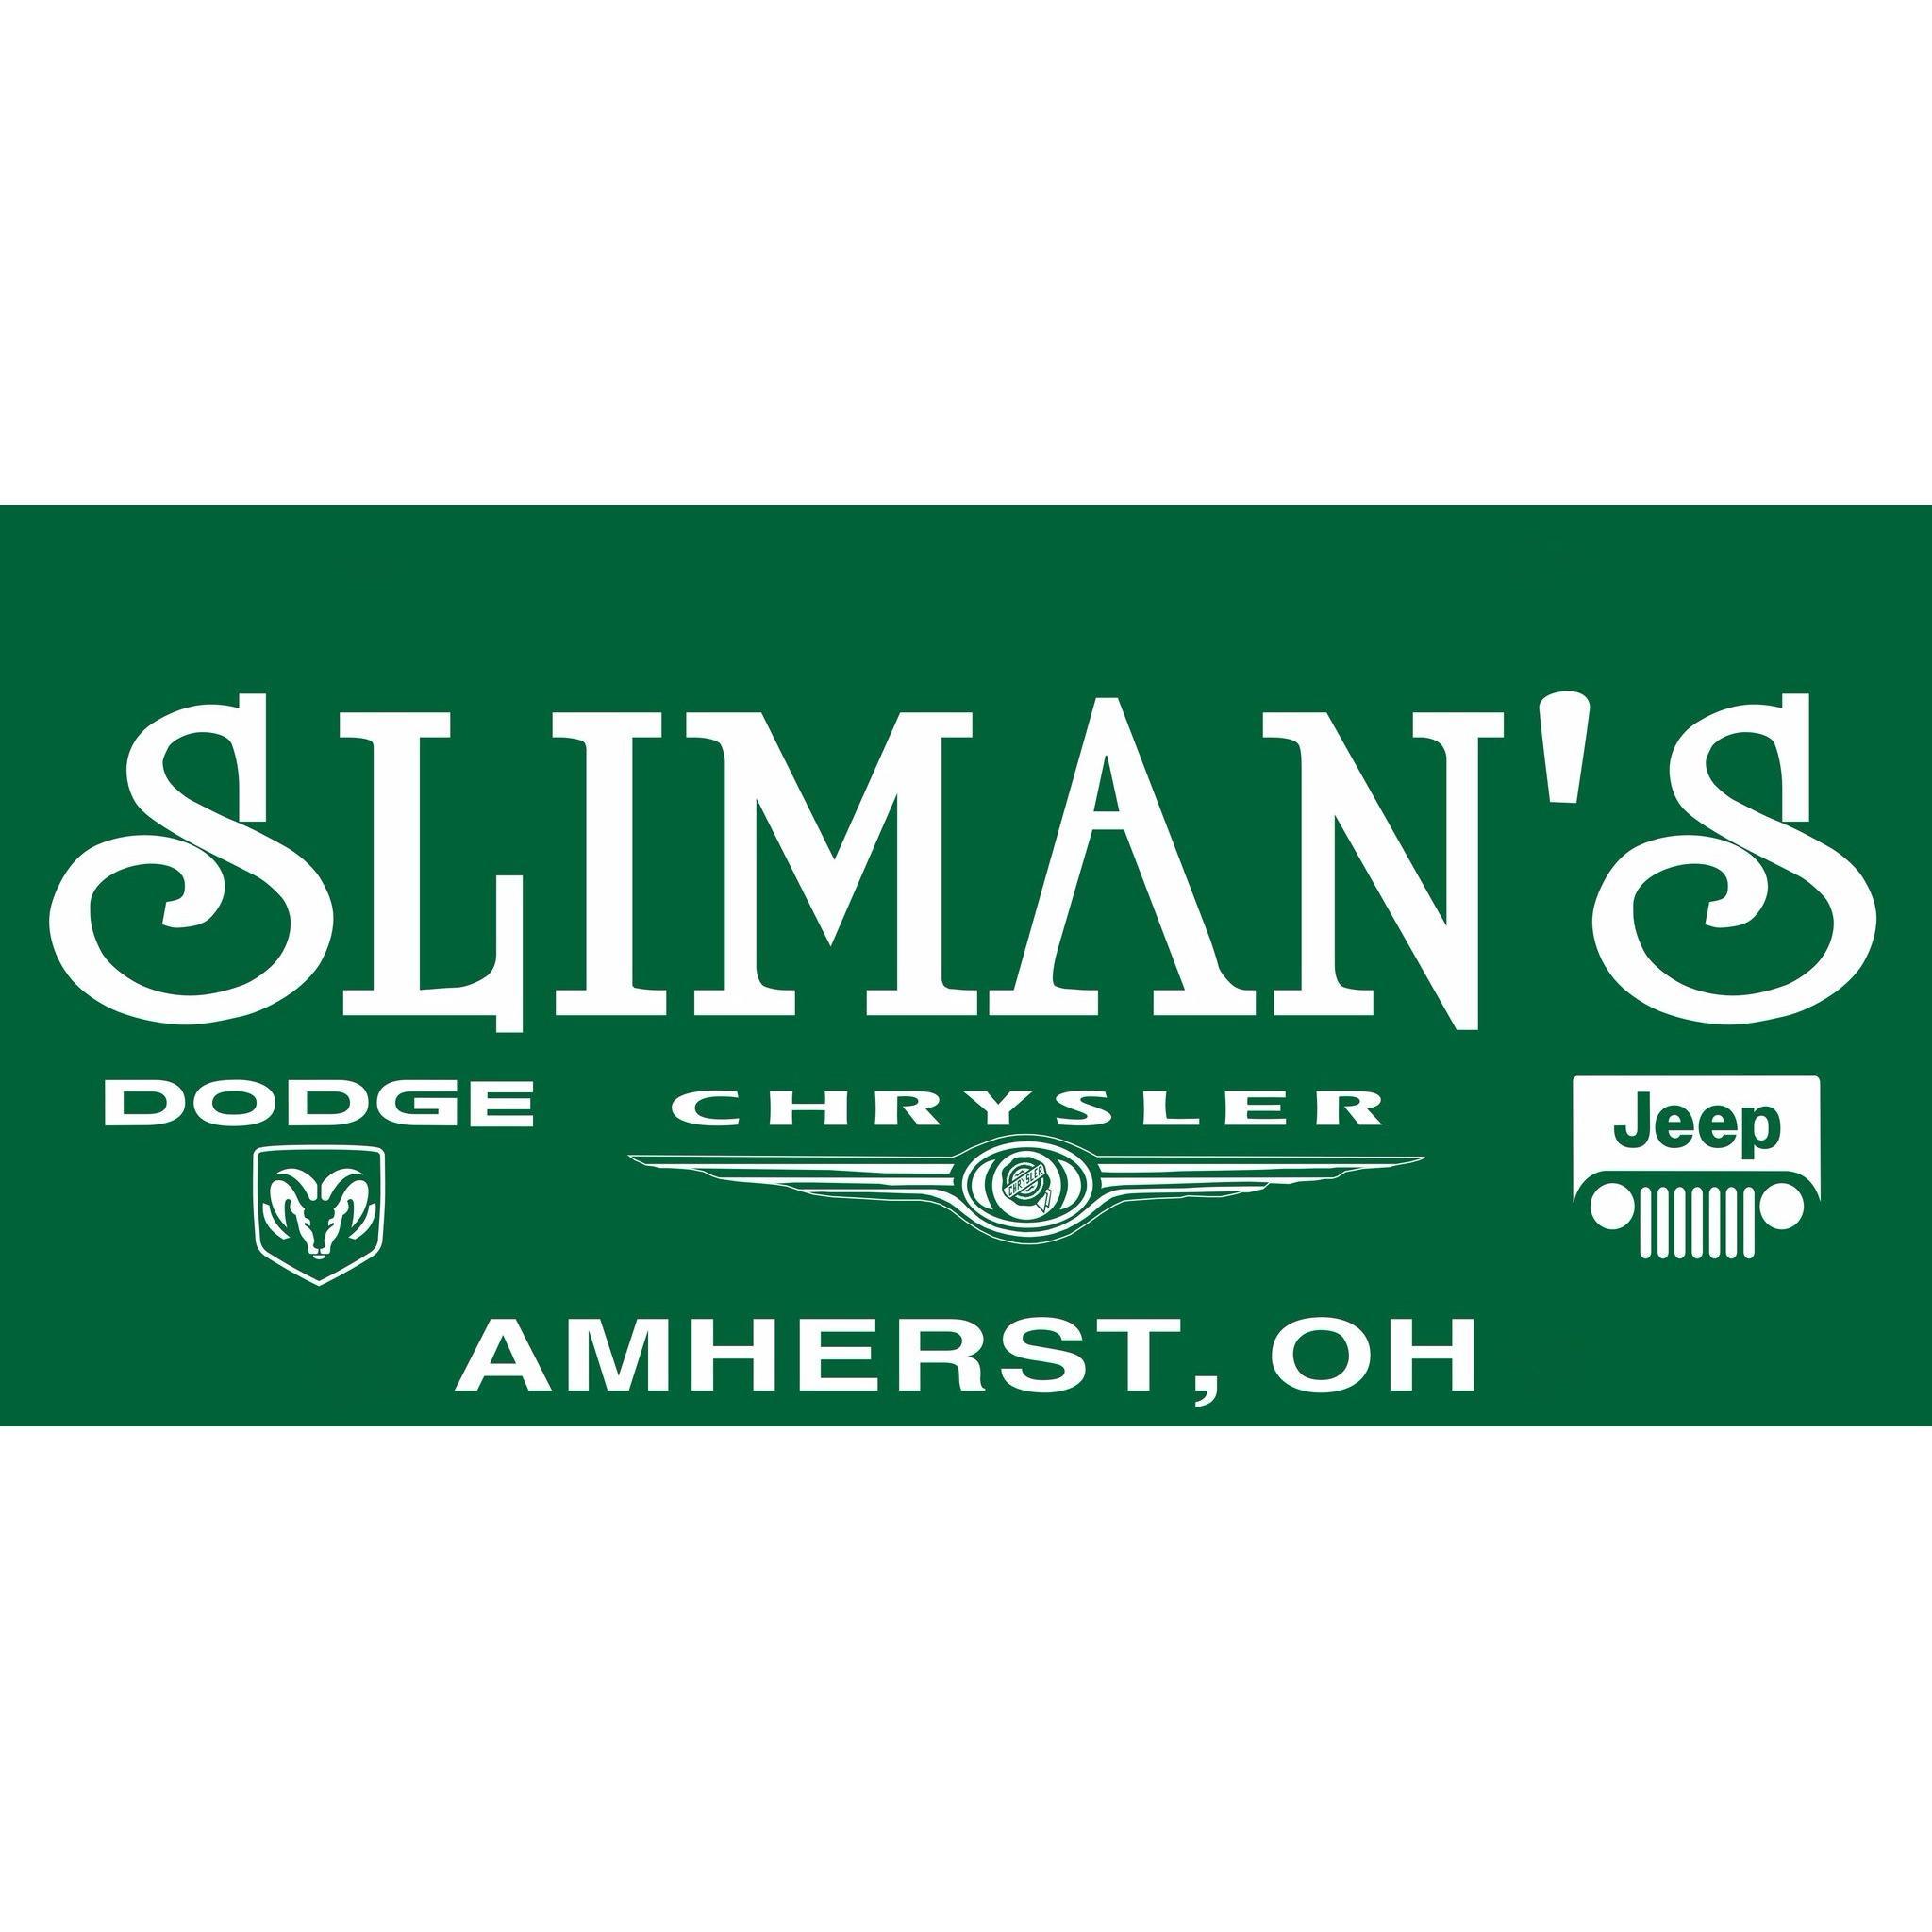 Sliman's Sales & Service - Amherst, OH - Auto Dealers